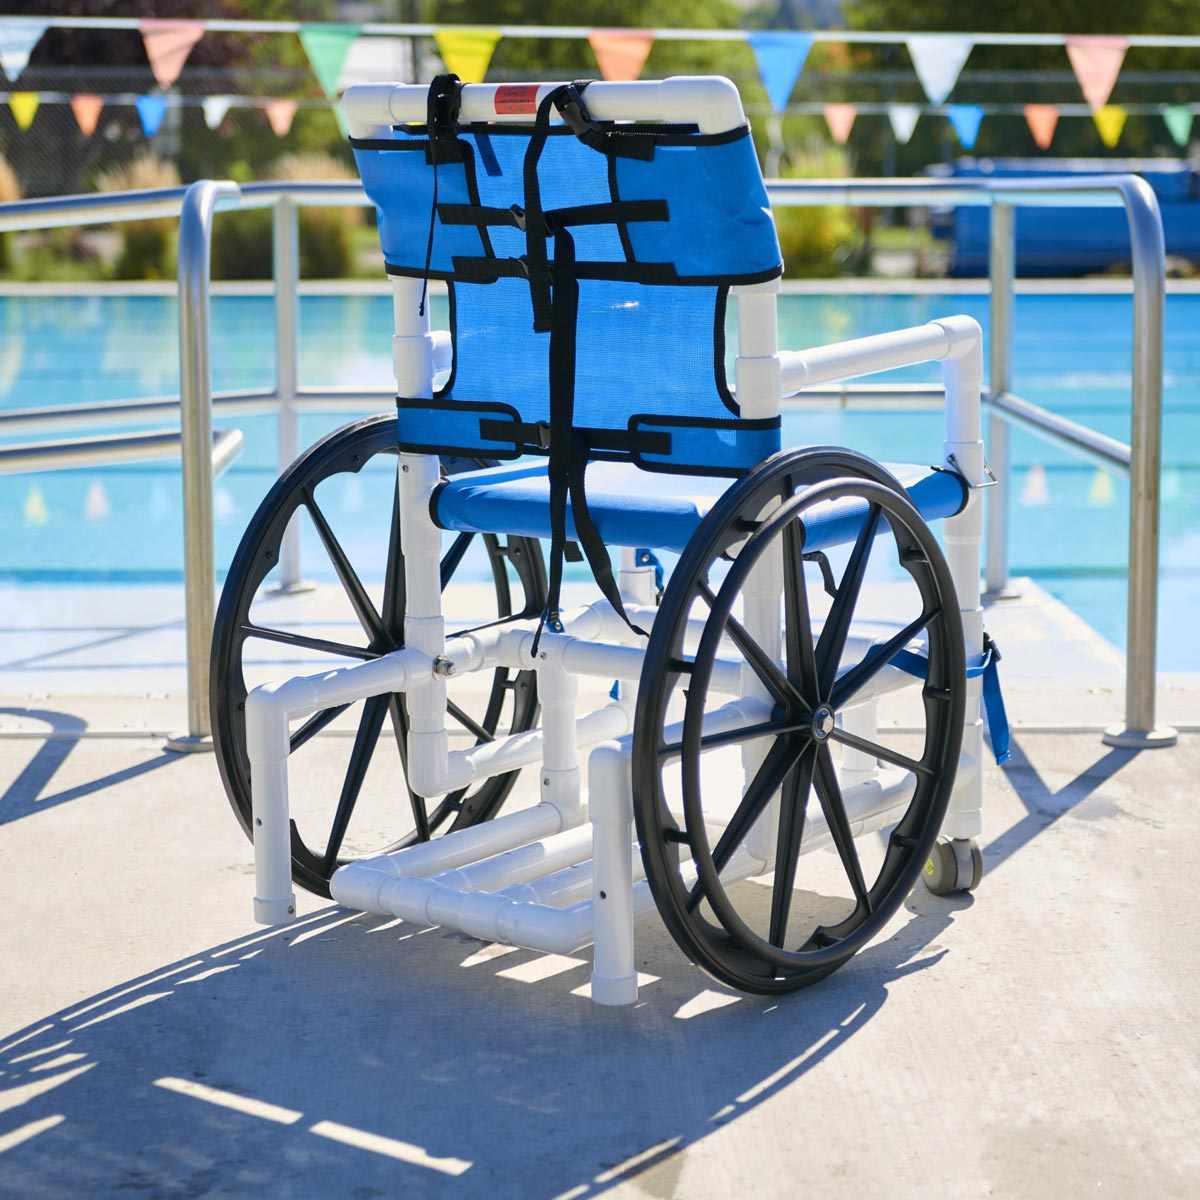 Aqua creek PVC pool chair